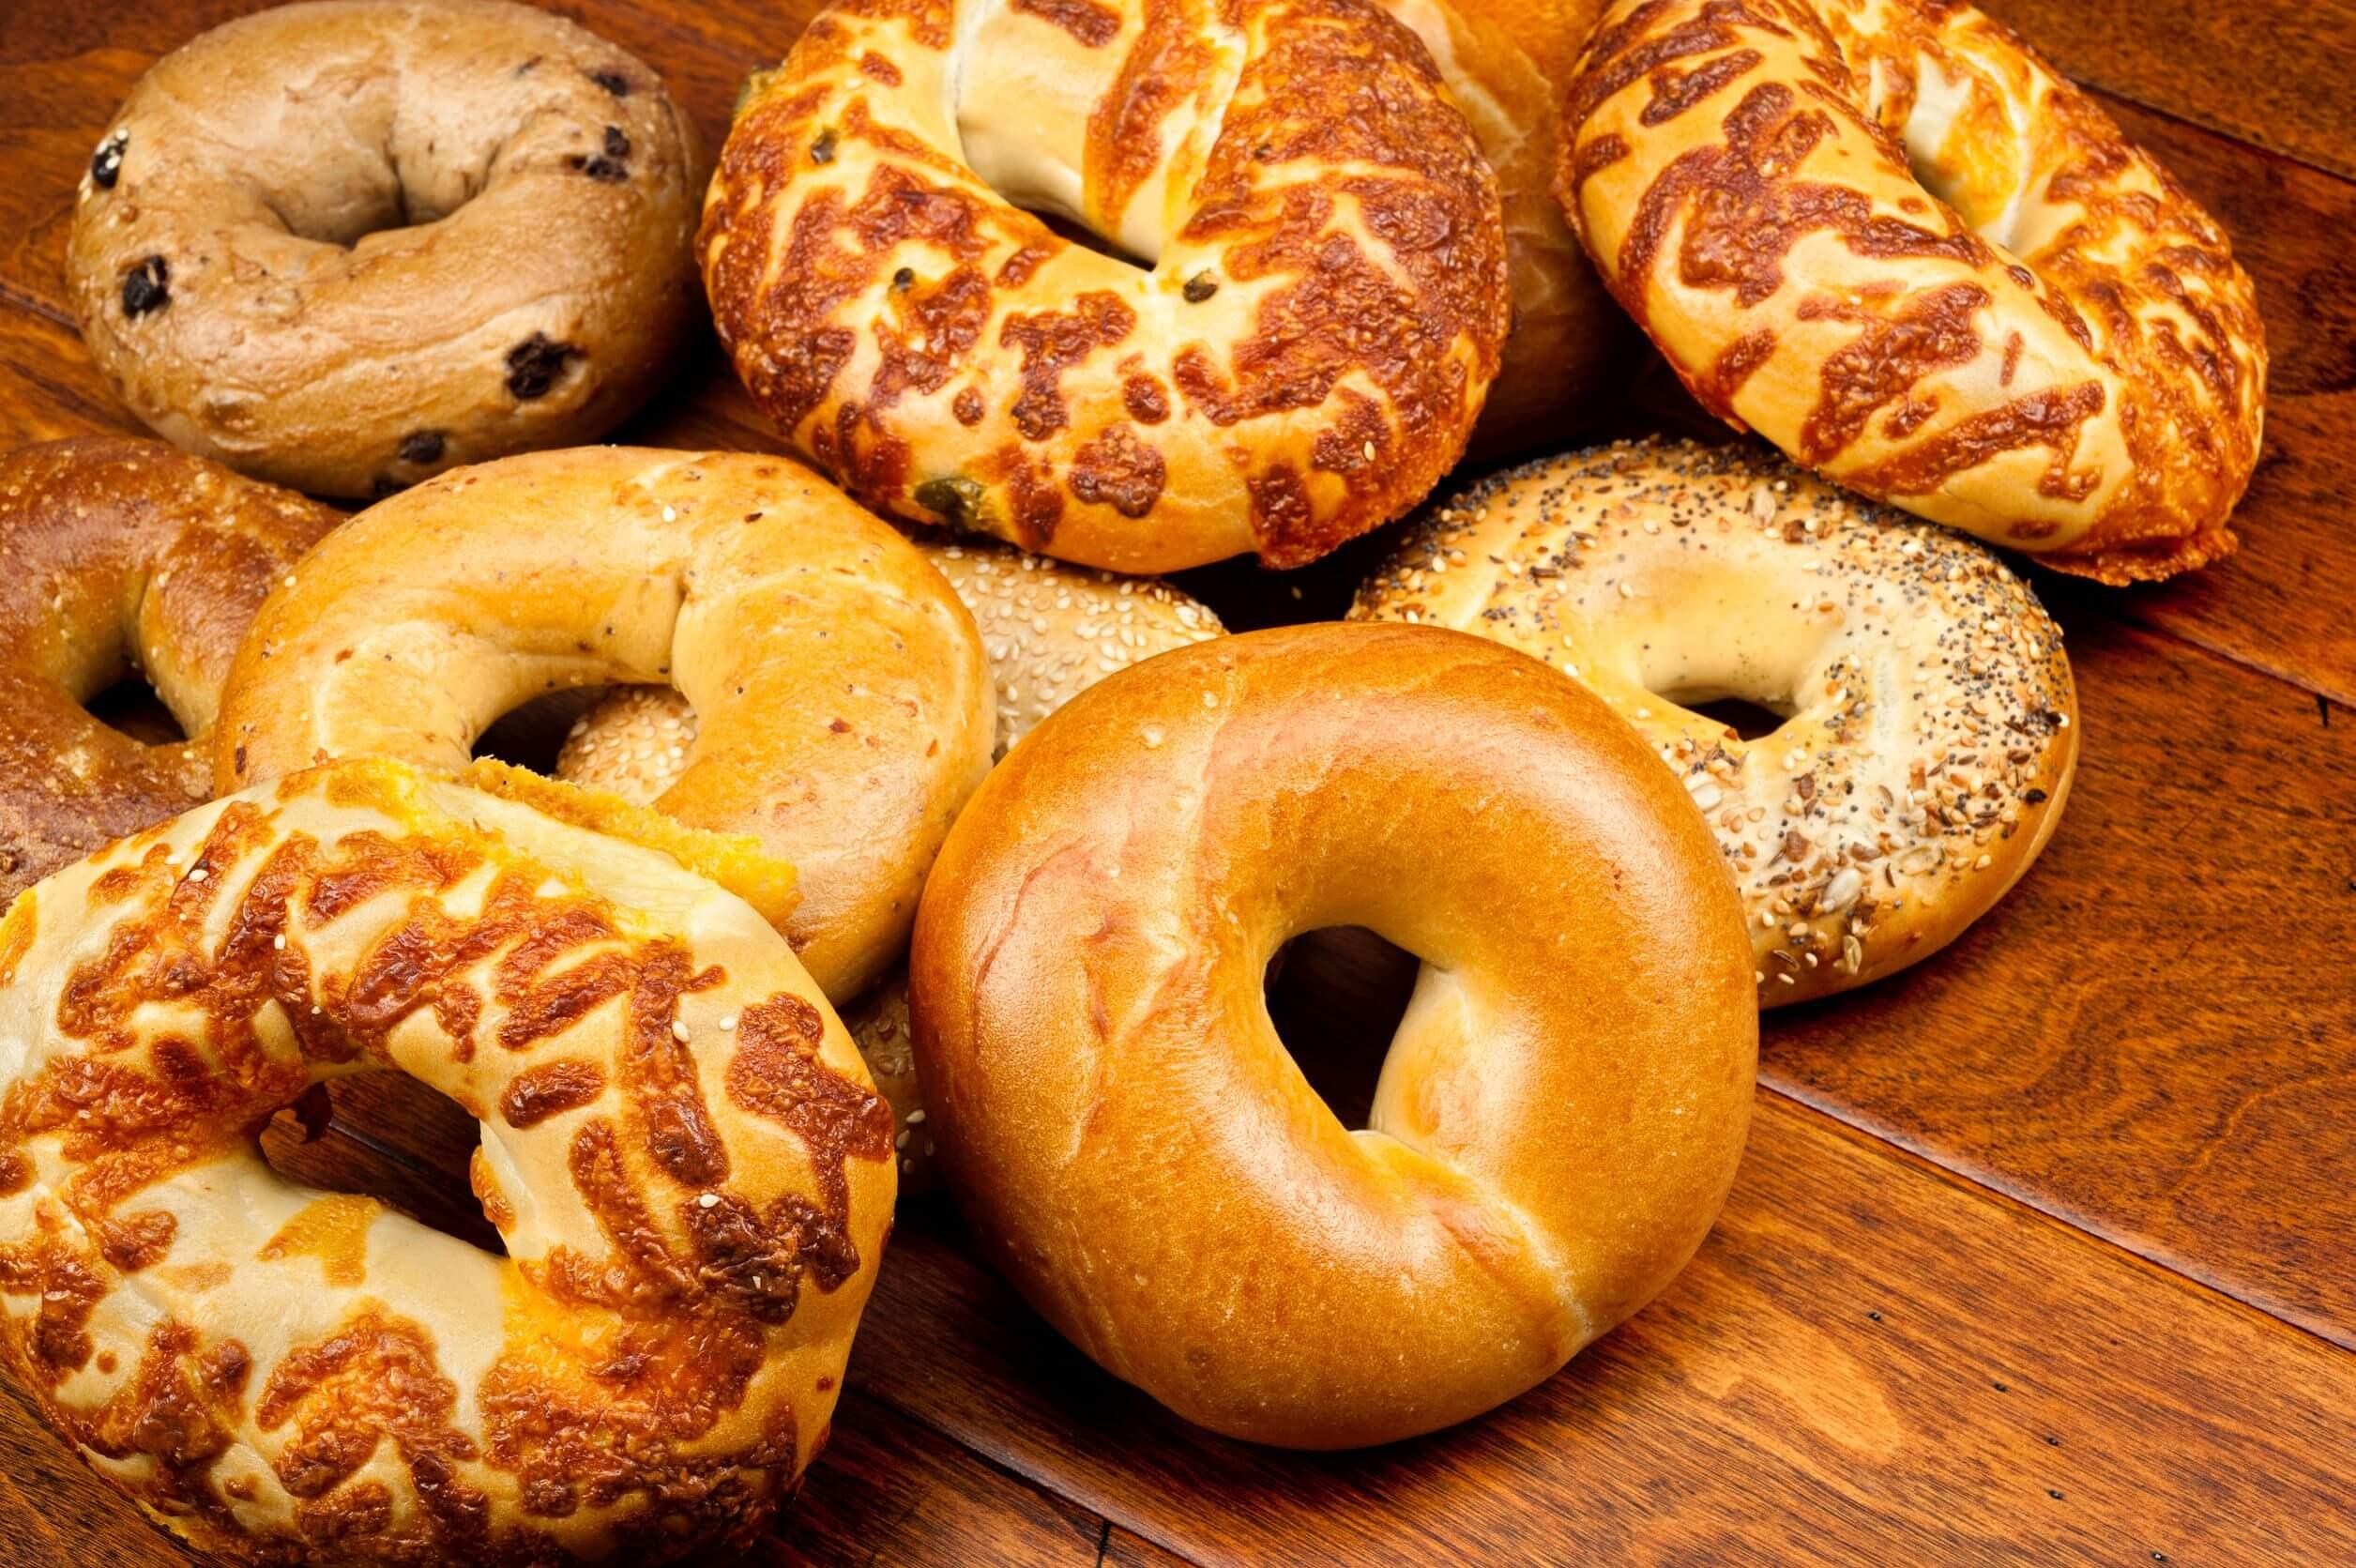 London's best bagels, London's best bagel, best bagel in london, bagels london, best bagels in london, london bagels best, breakfast in london, london bagel guide